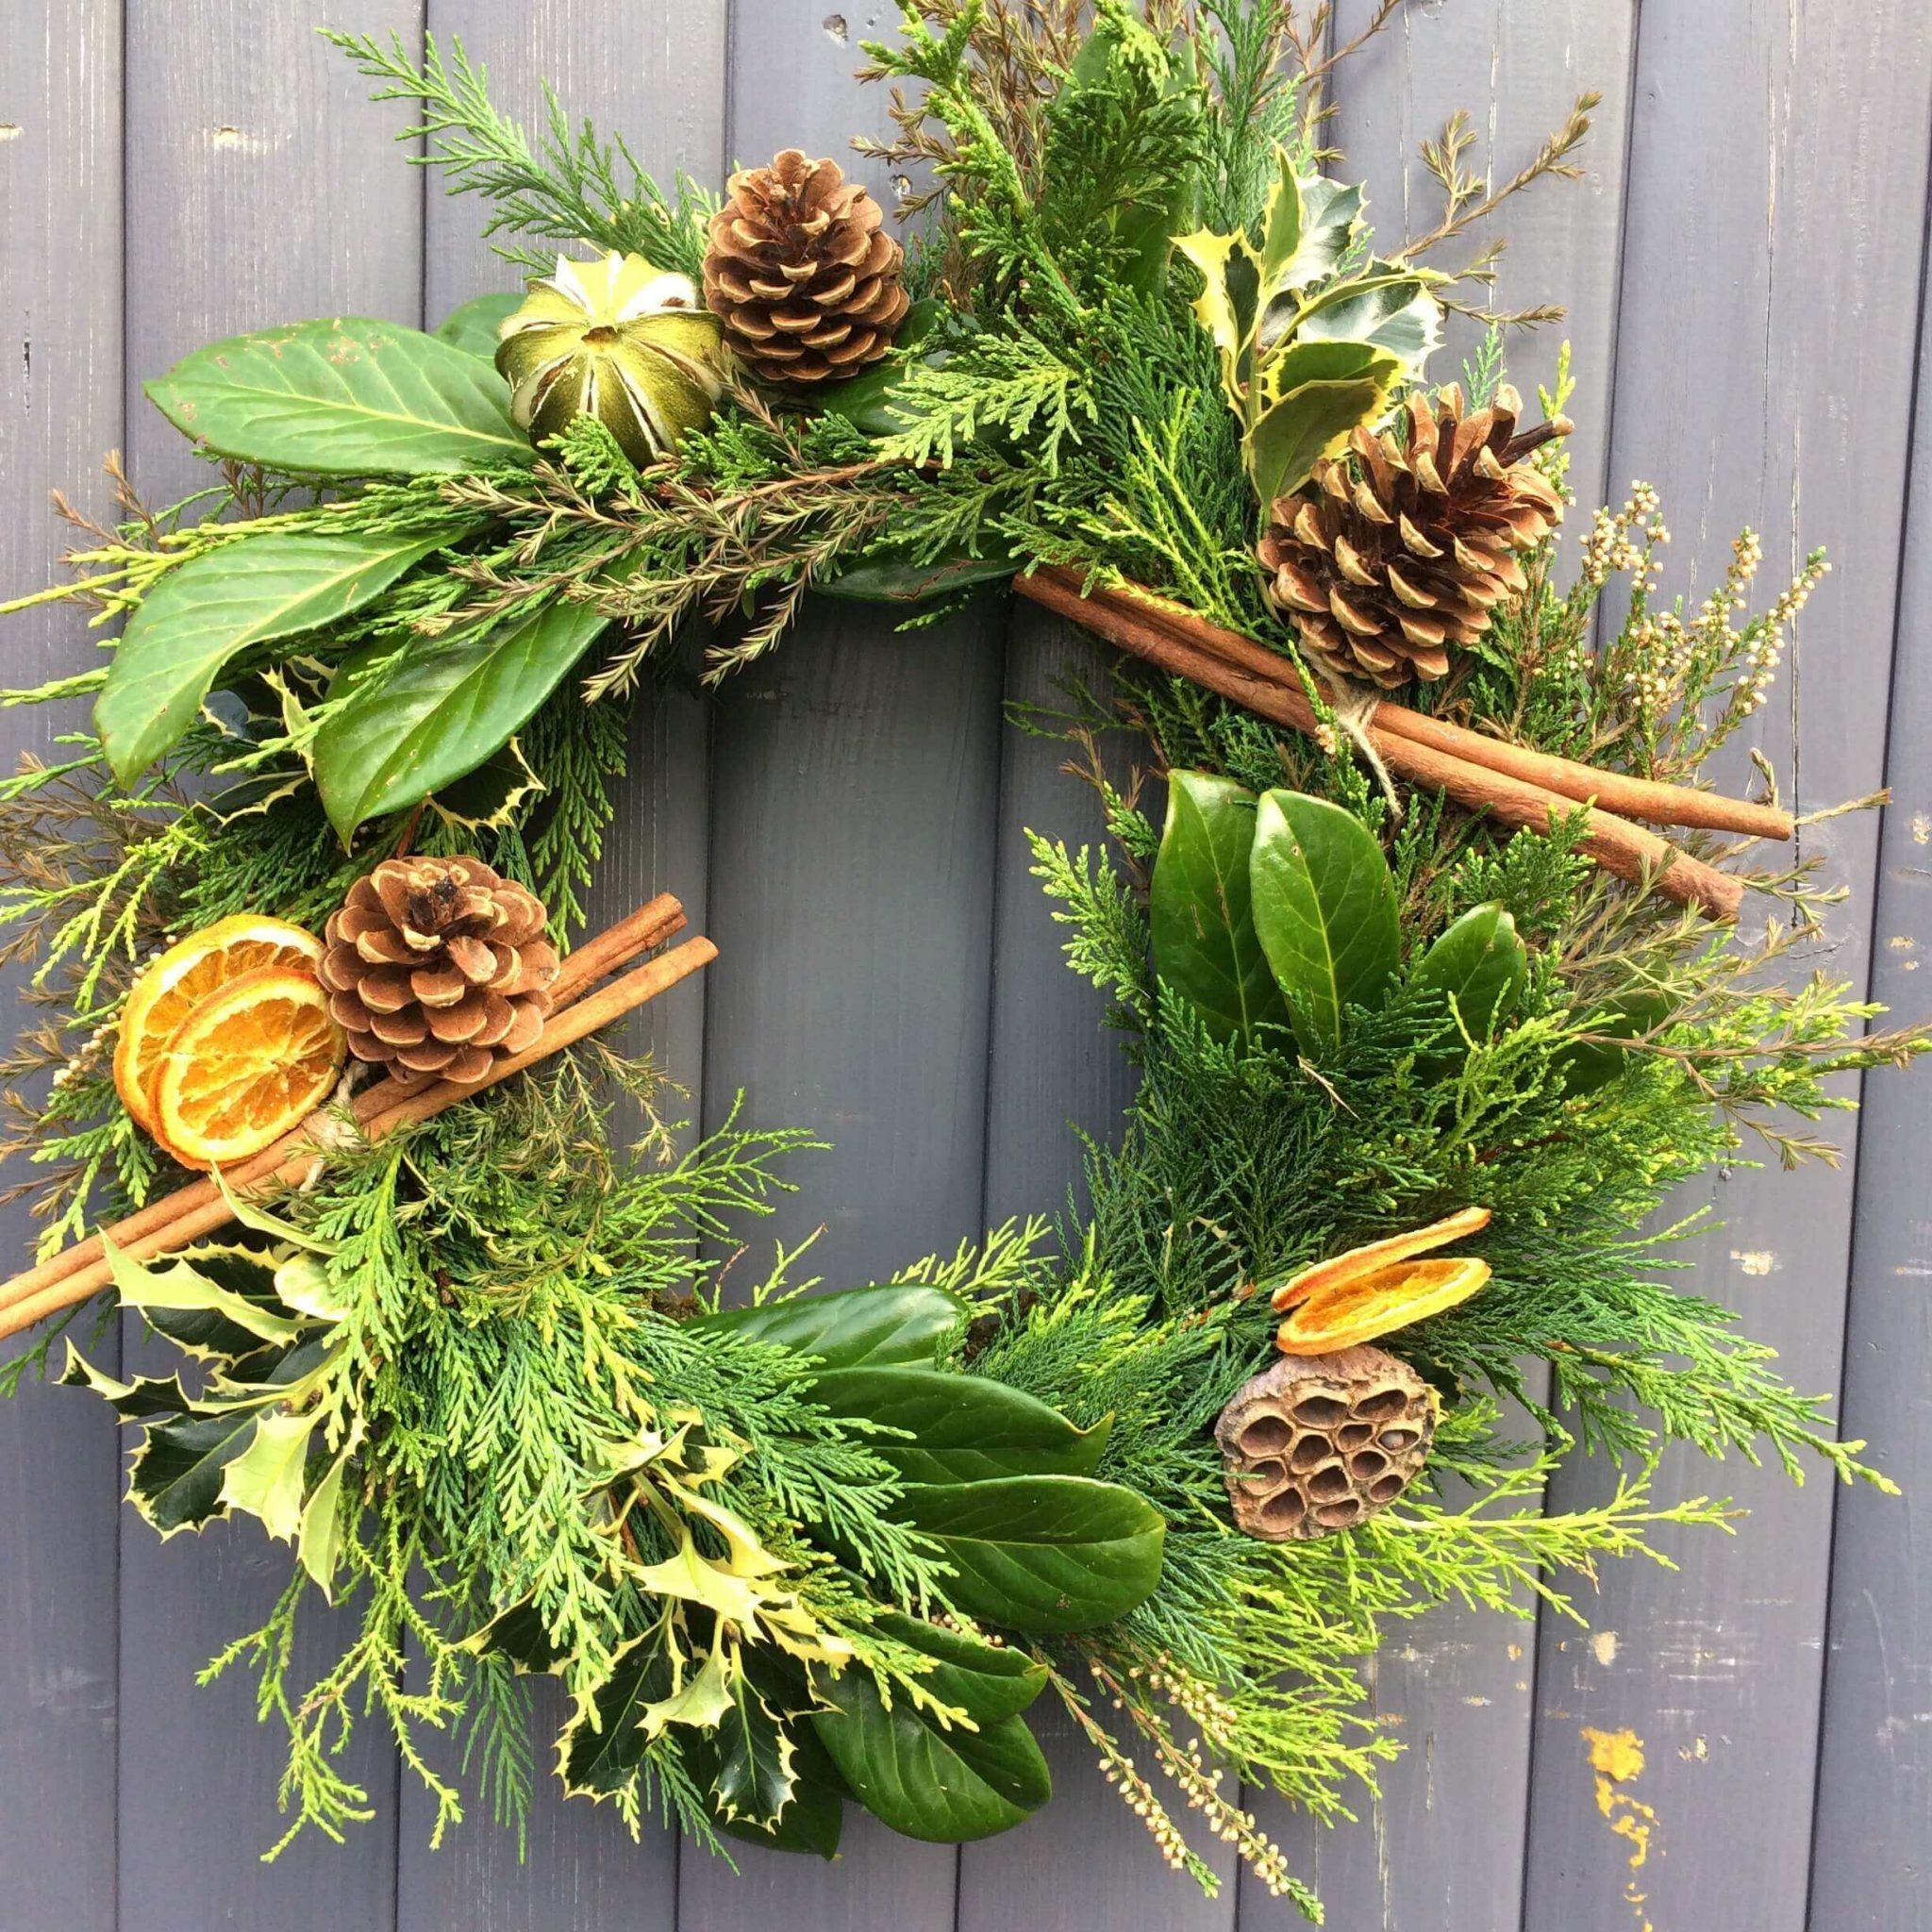 Etsy Christmas wreath kit